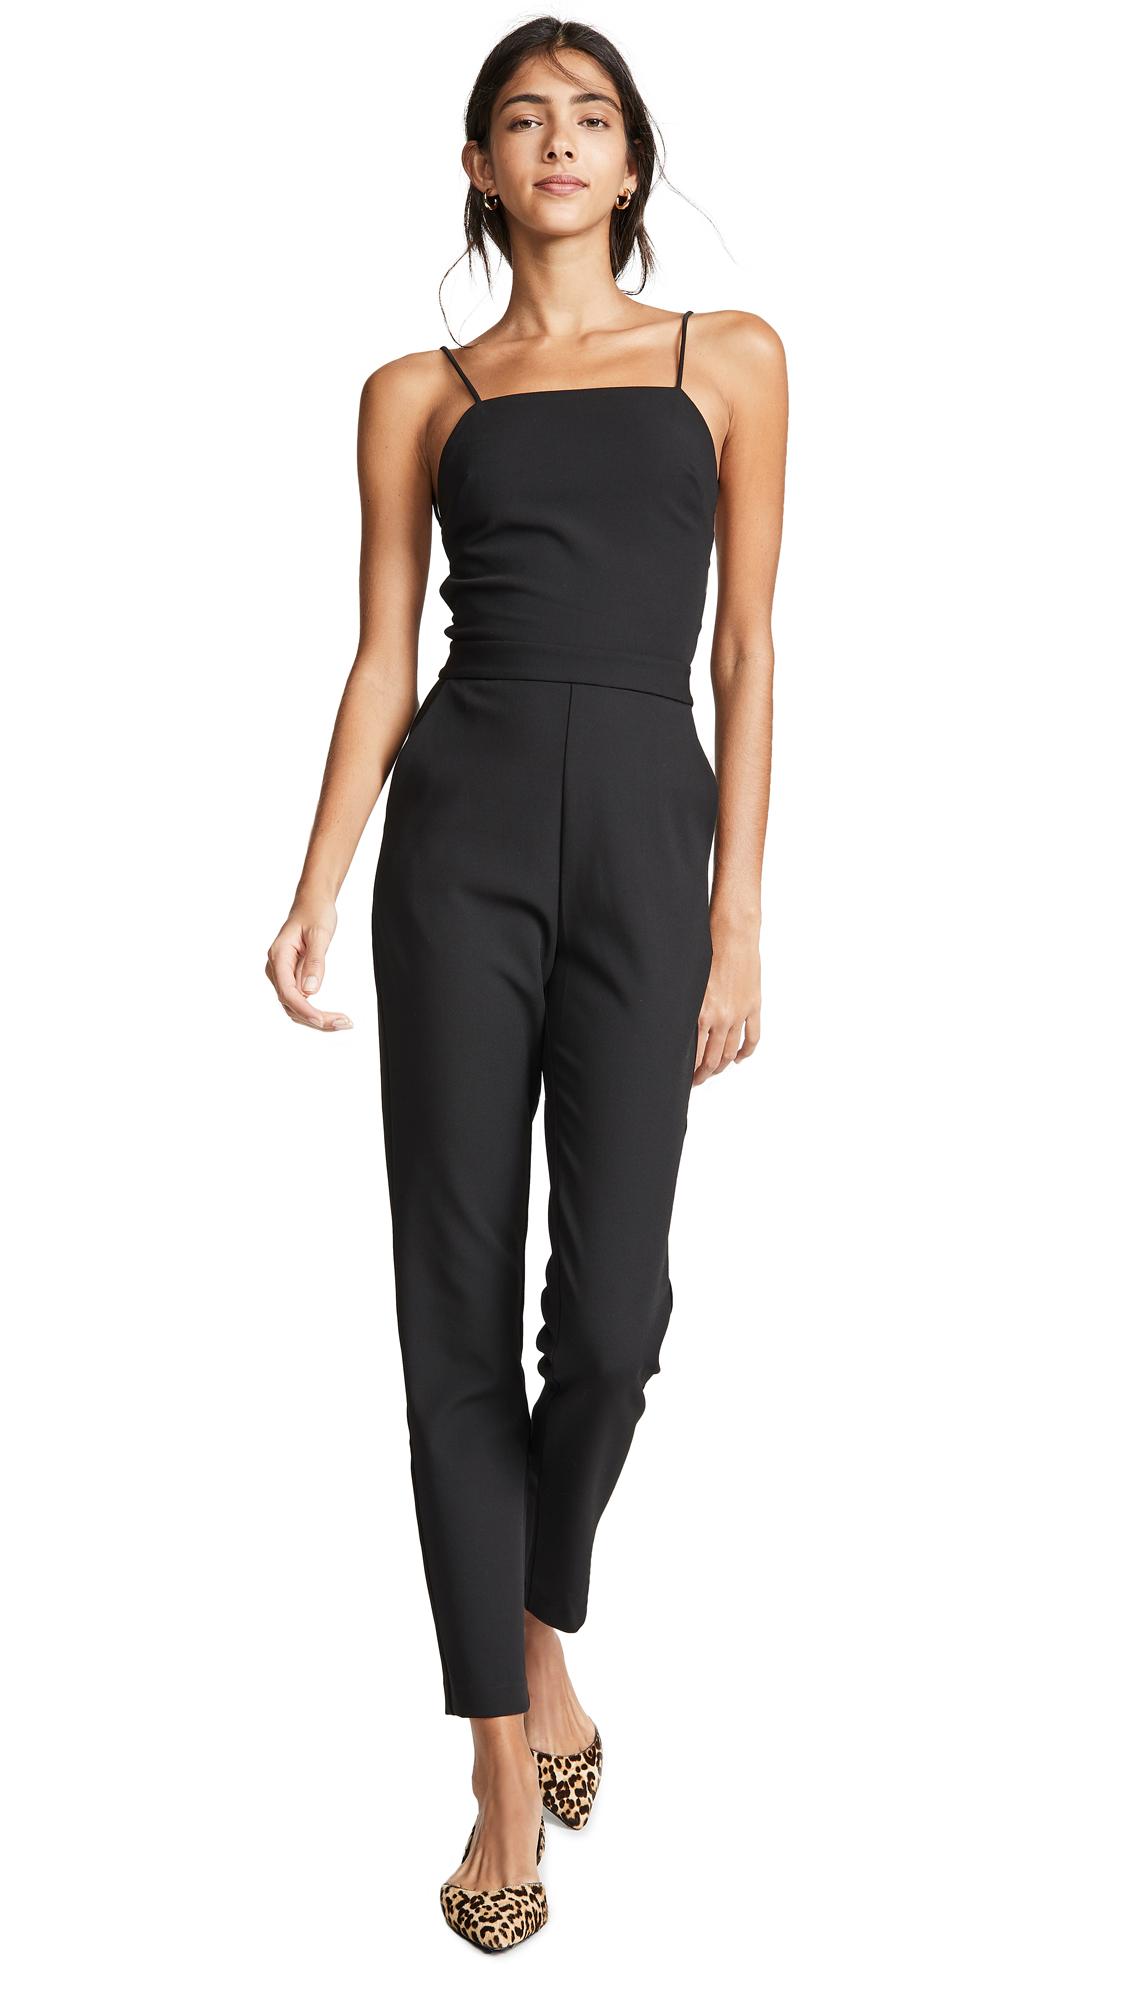 Bec & Bridge Sofia Jumpsuit - Black